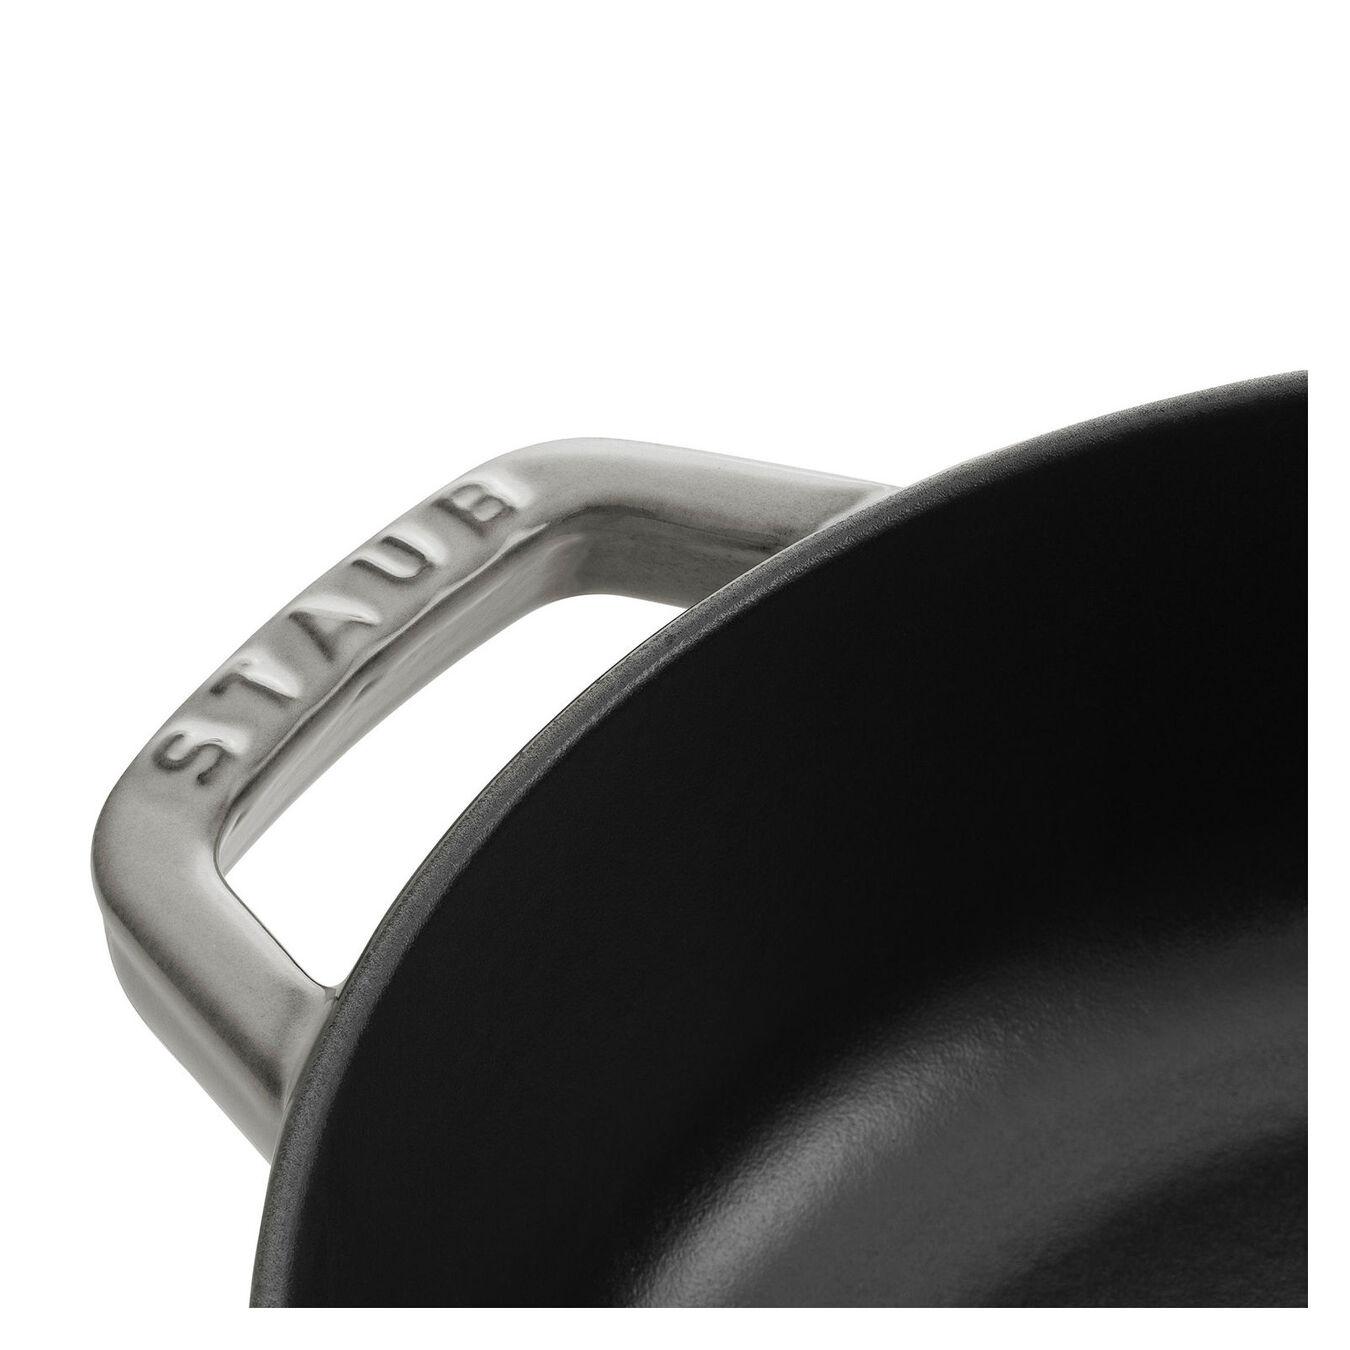 Caçarola redonda baixa chistera Chistera 28 cm, Ferro fundido,,large 3